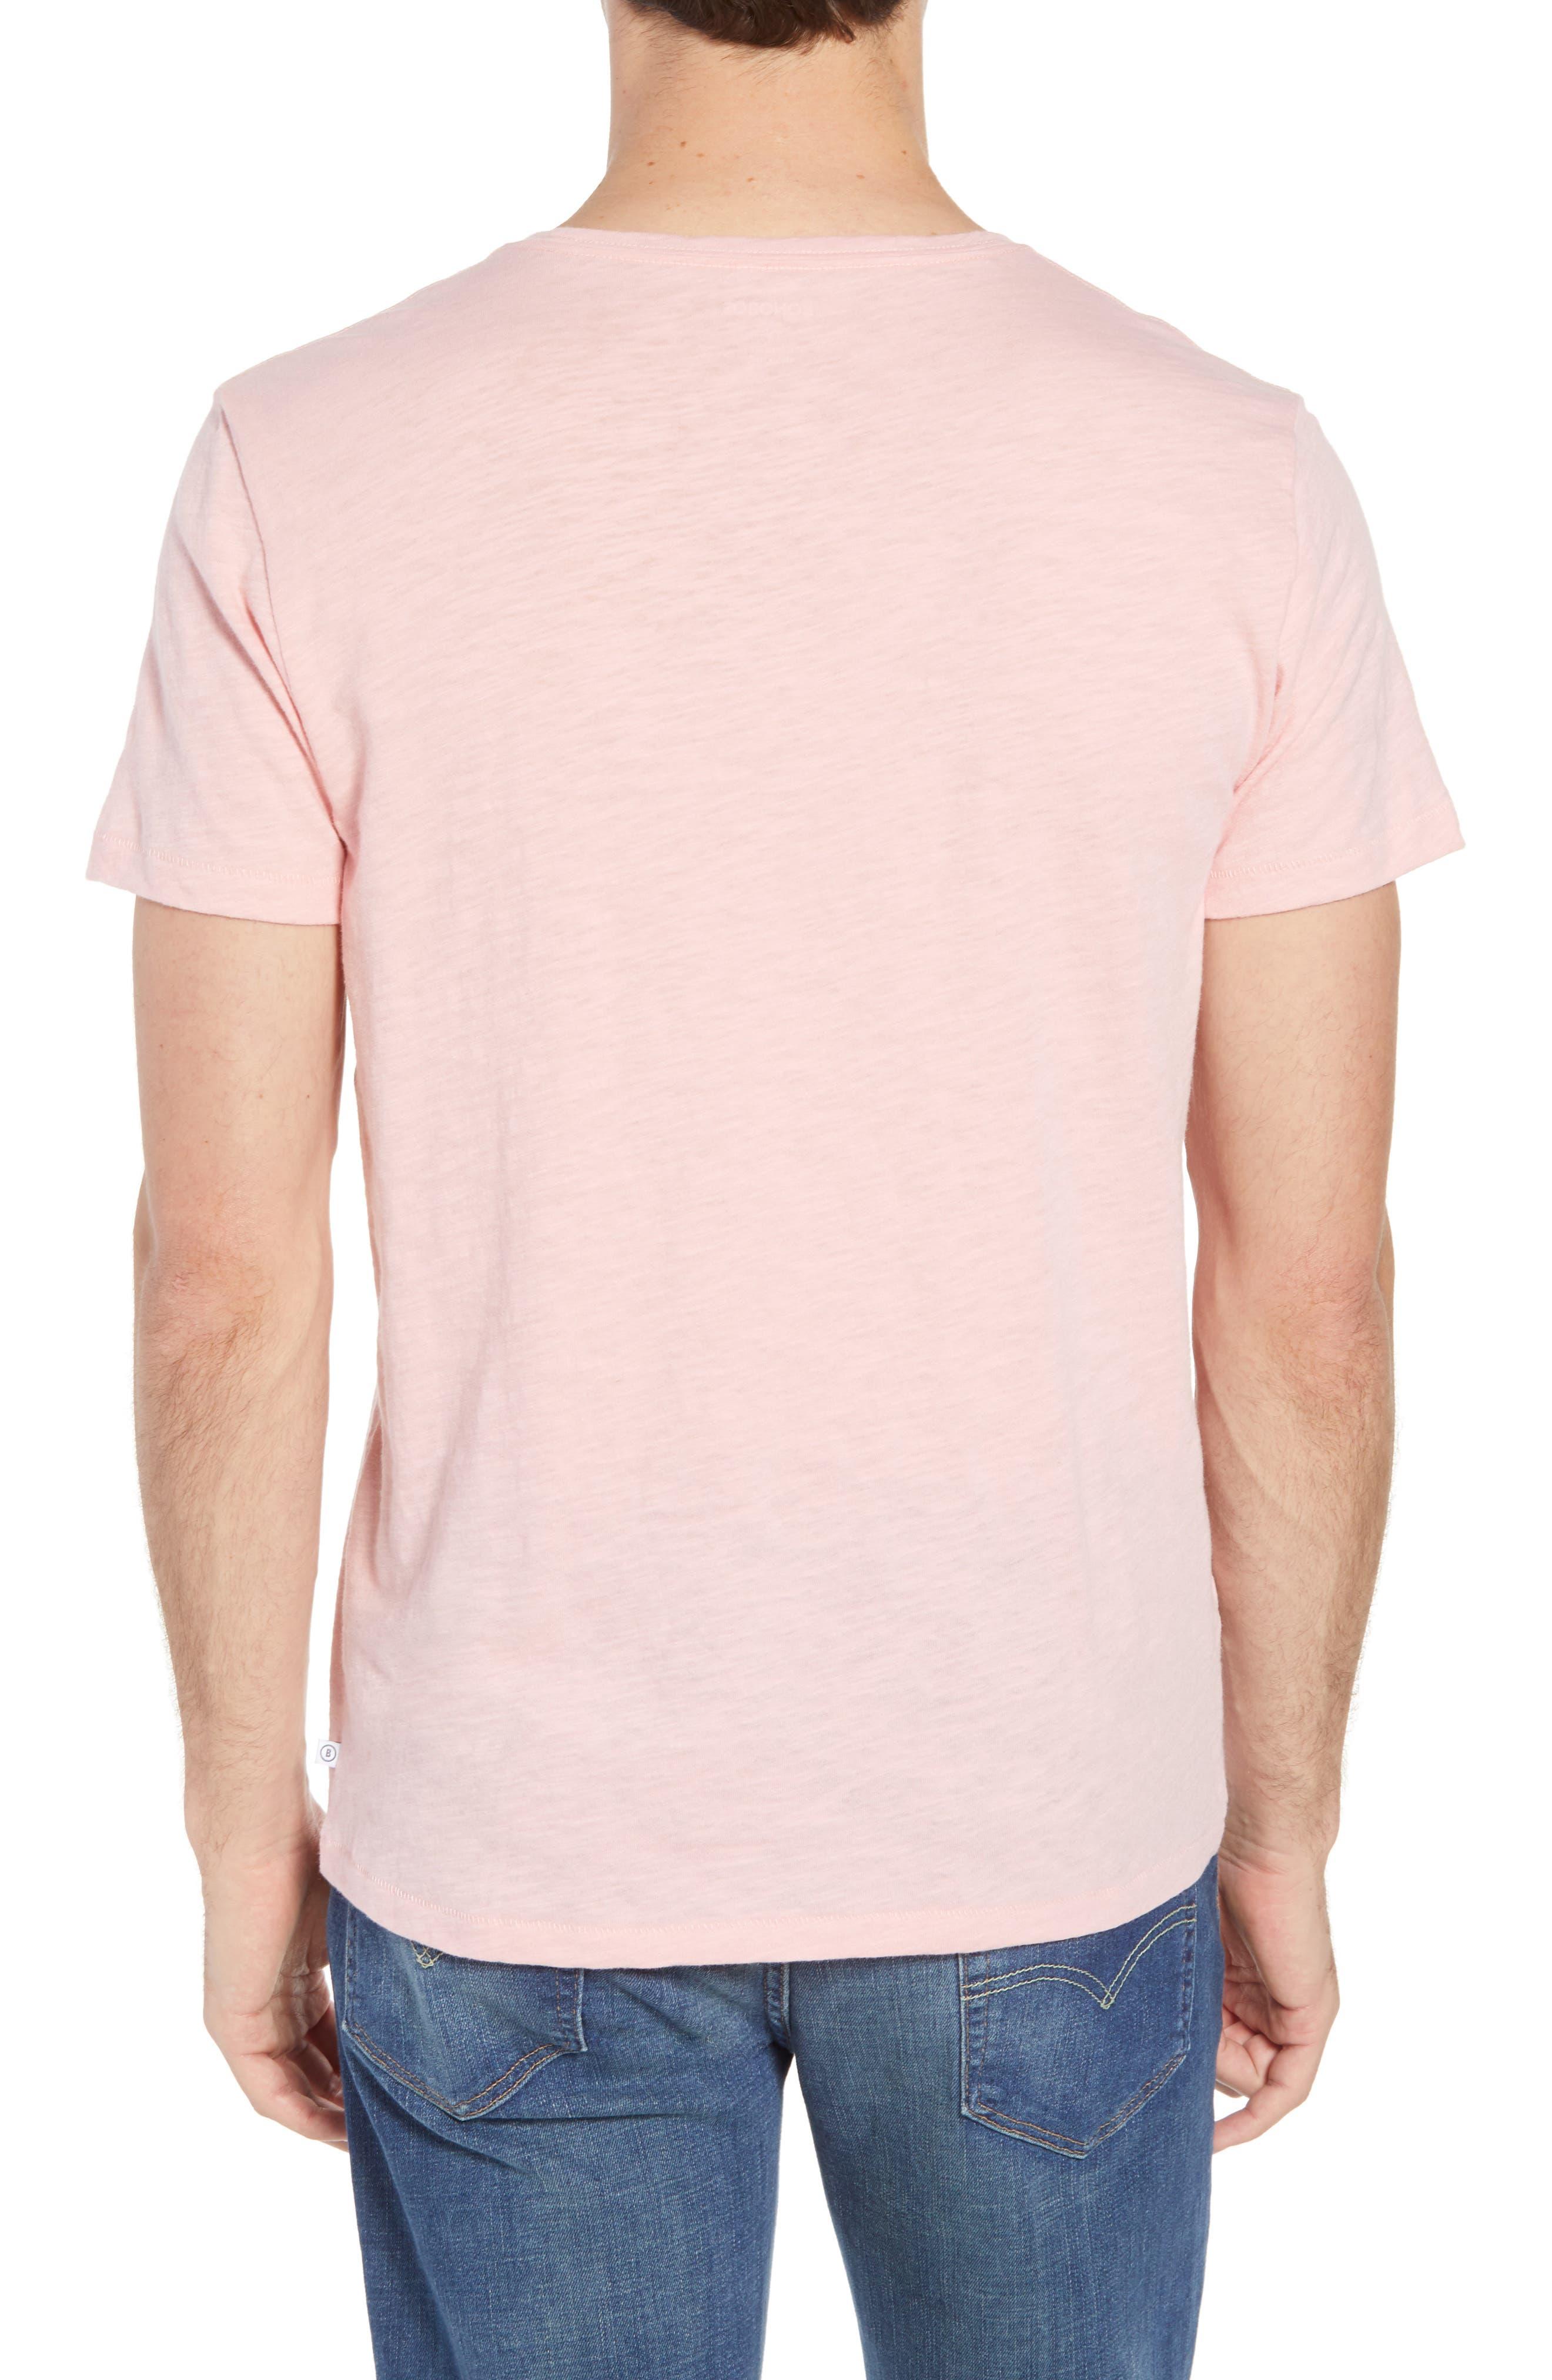 Stoked Slub T-Shirt,                             Alternate thumbnail 2, color,                             Pink Stoked